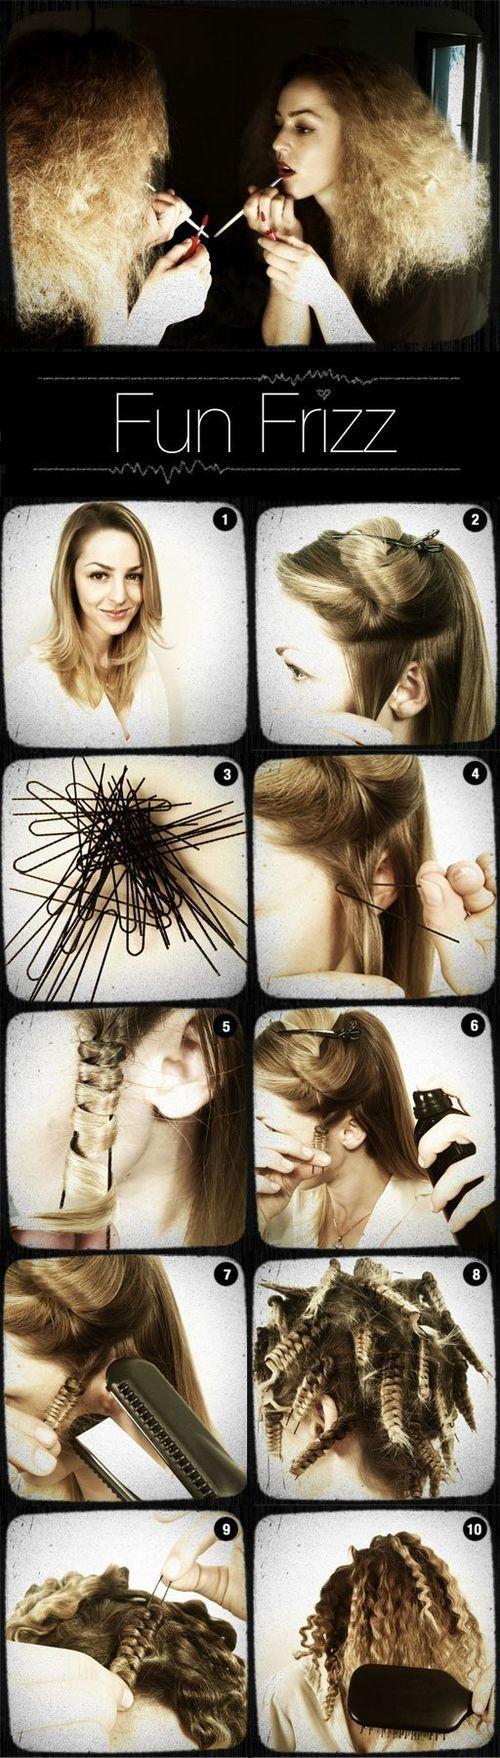 diy hair style diy easy diy diy beauty diy hair diy fashion beauty diy diy style diy hair style diy frizzy hair